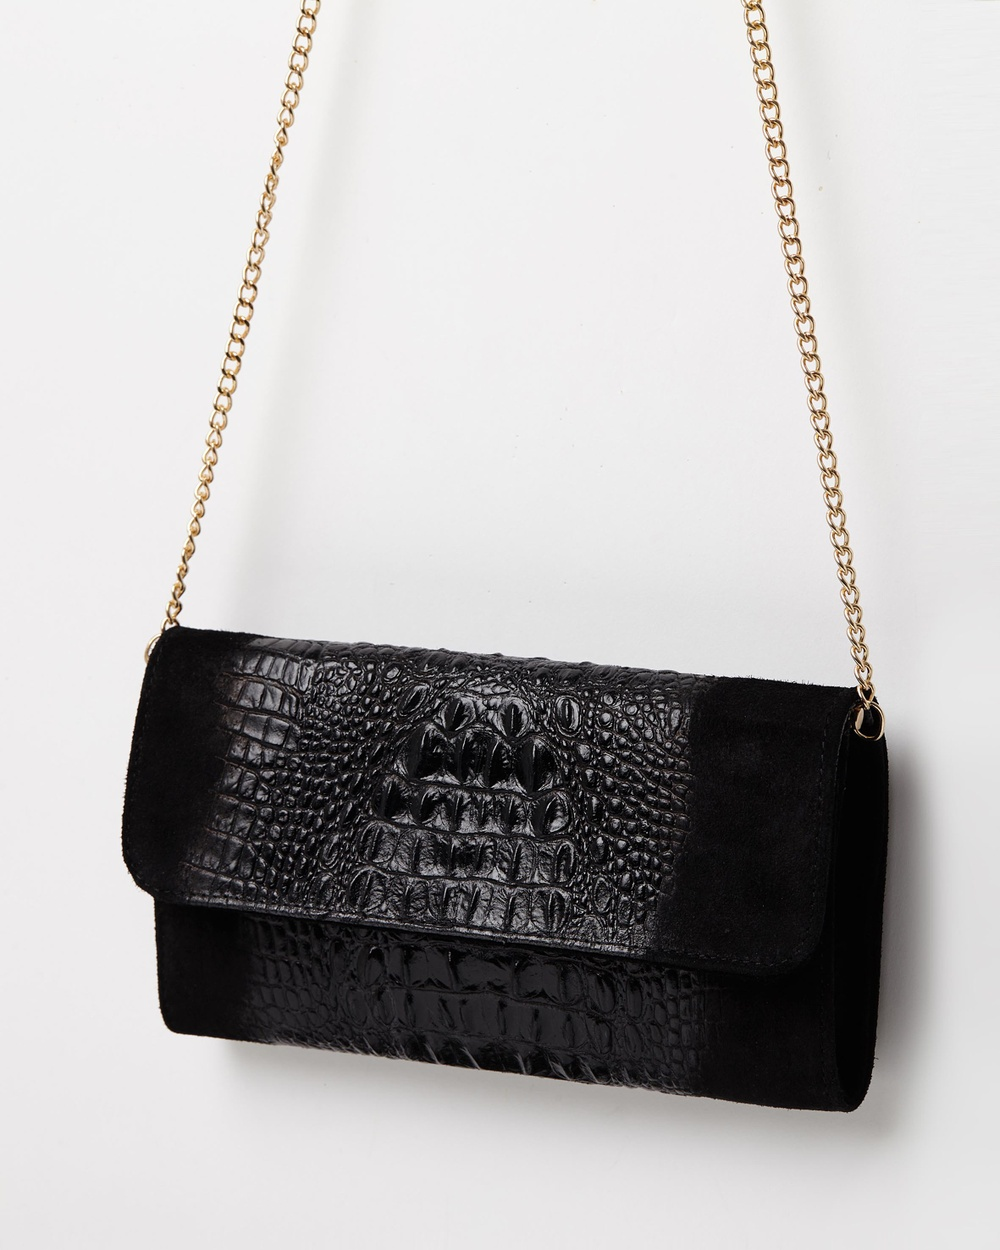 Marlafiji Kim black suede croc embossed Italian Suede clutch shoulder bag Clutches Black Leather bags Australia